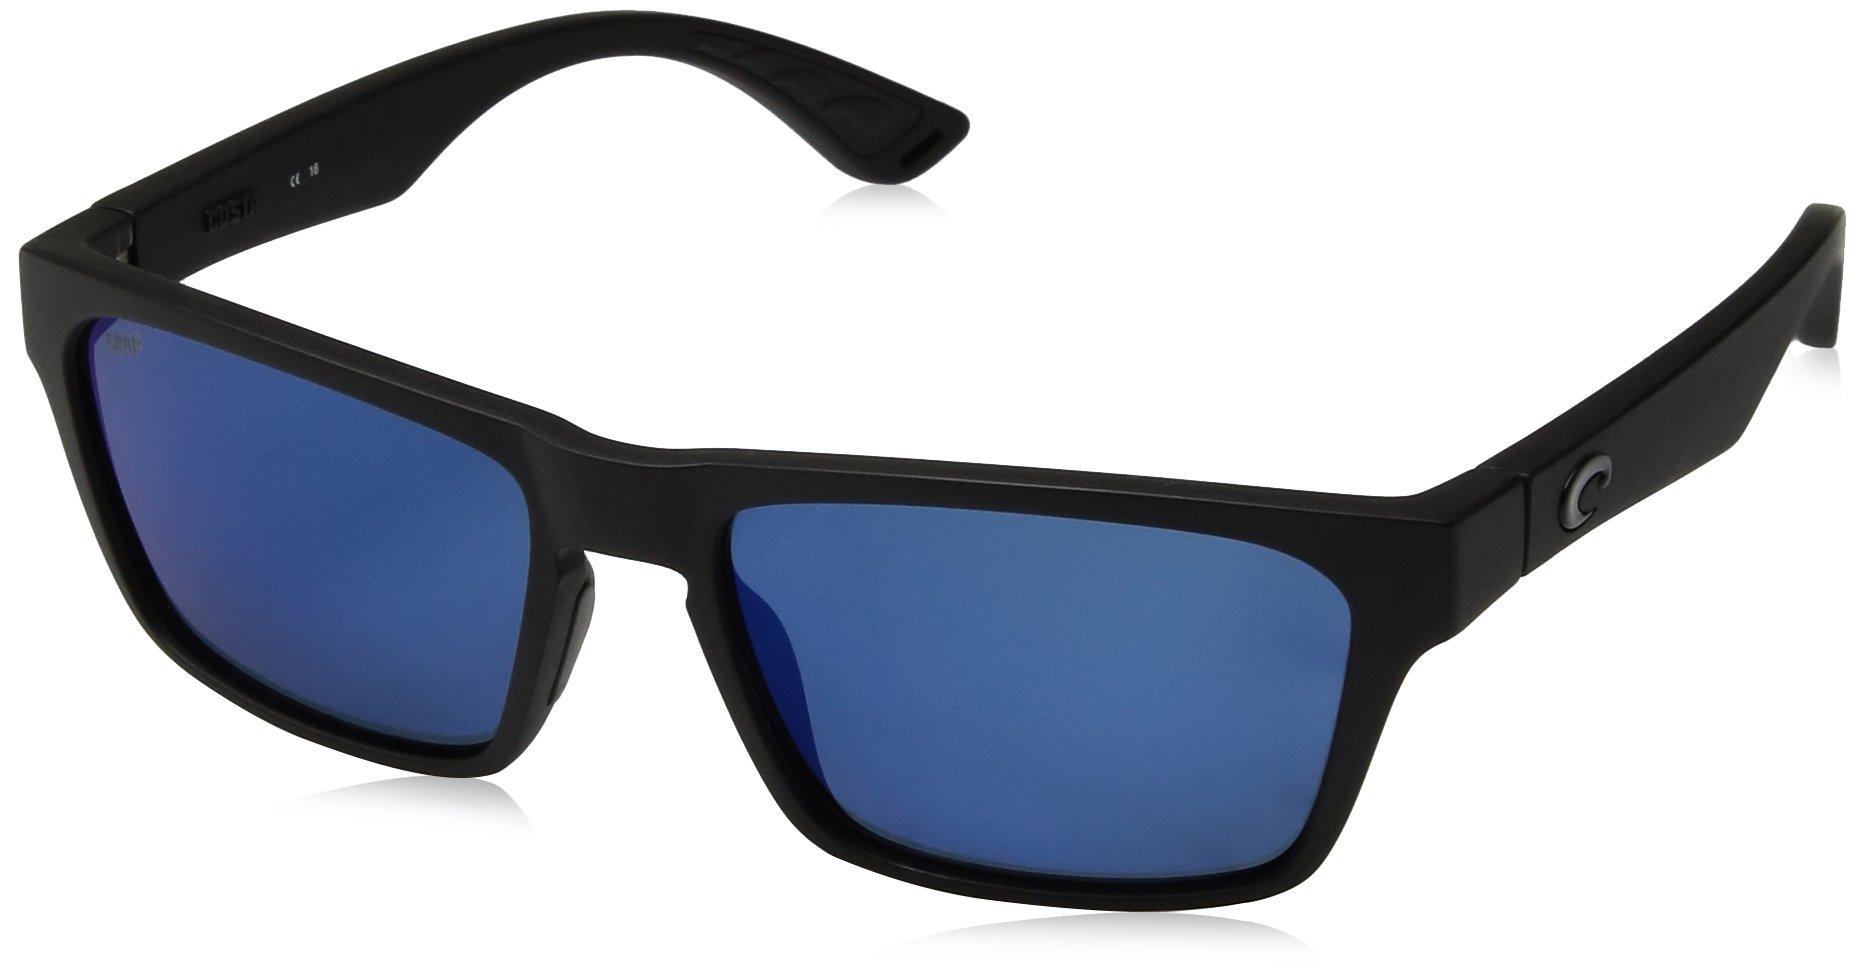 Costa Del Mar Hinano Sunglasses, Blackout, Blue Mirror 580P Lens by Costa Del Mar